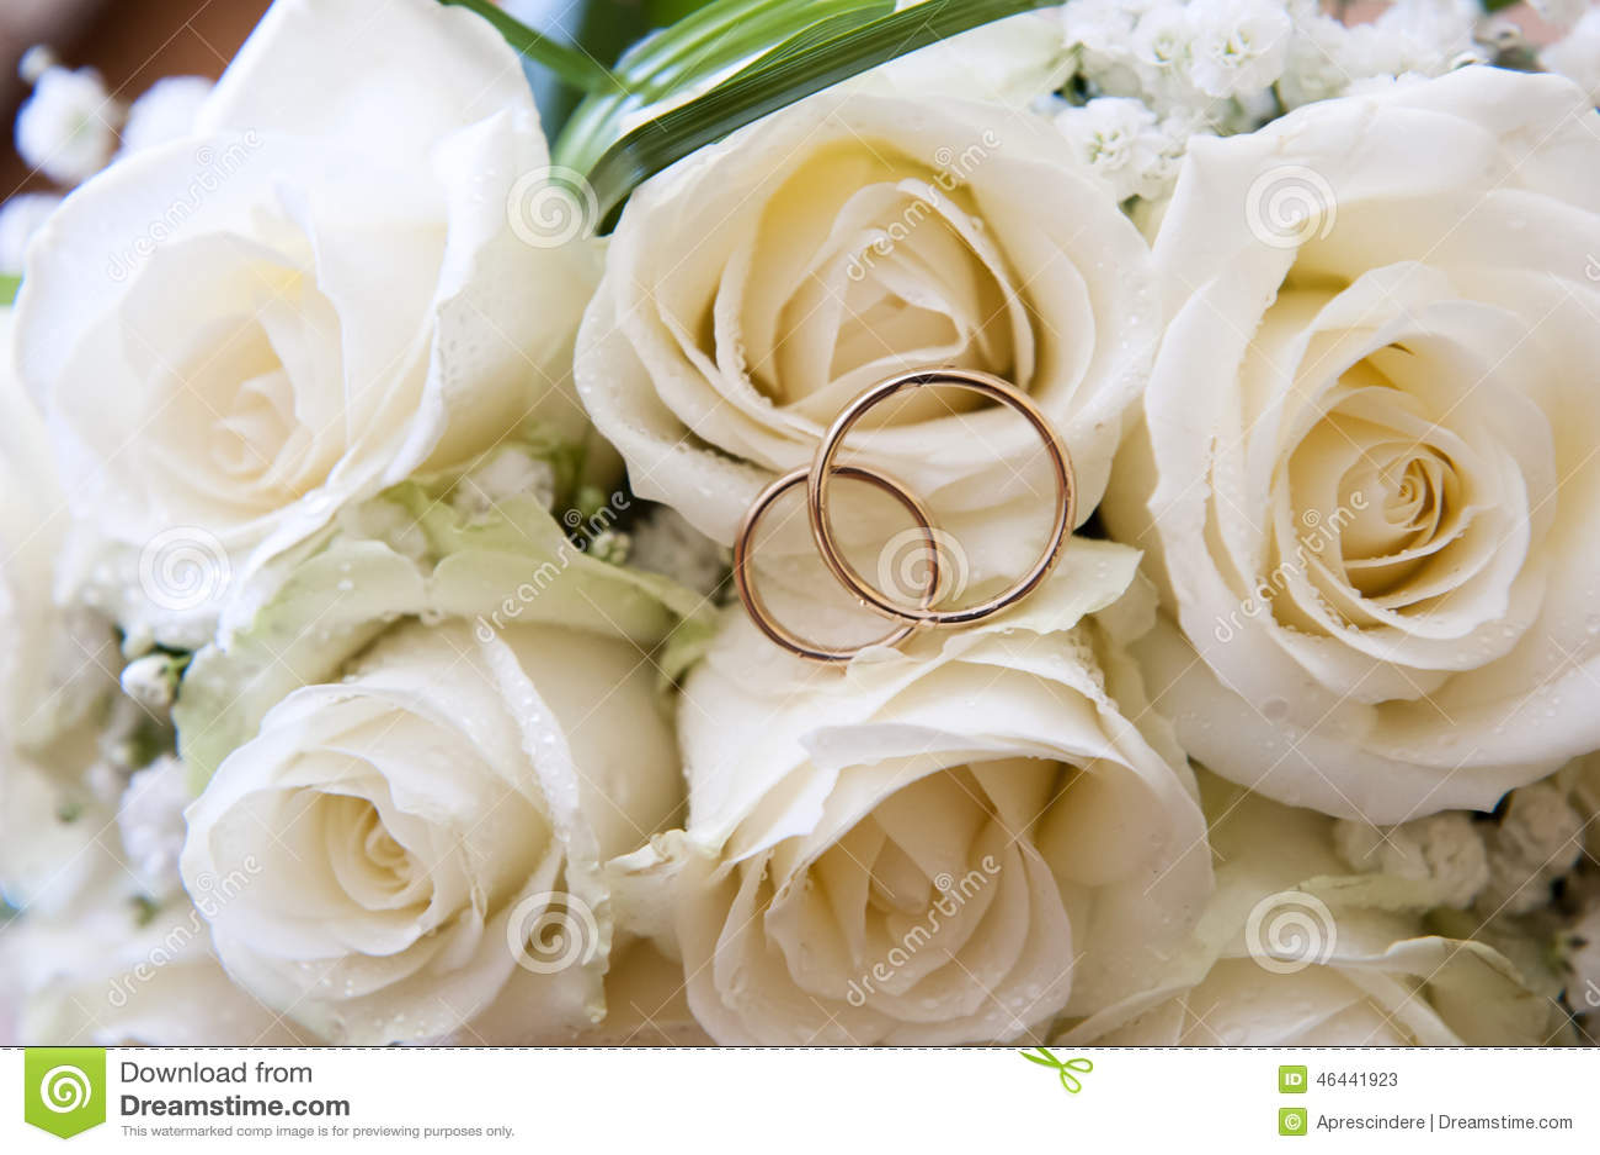 White Ring Roses Download